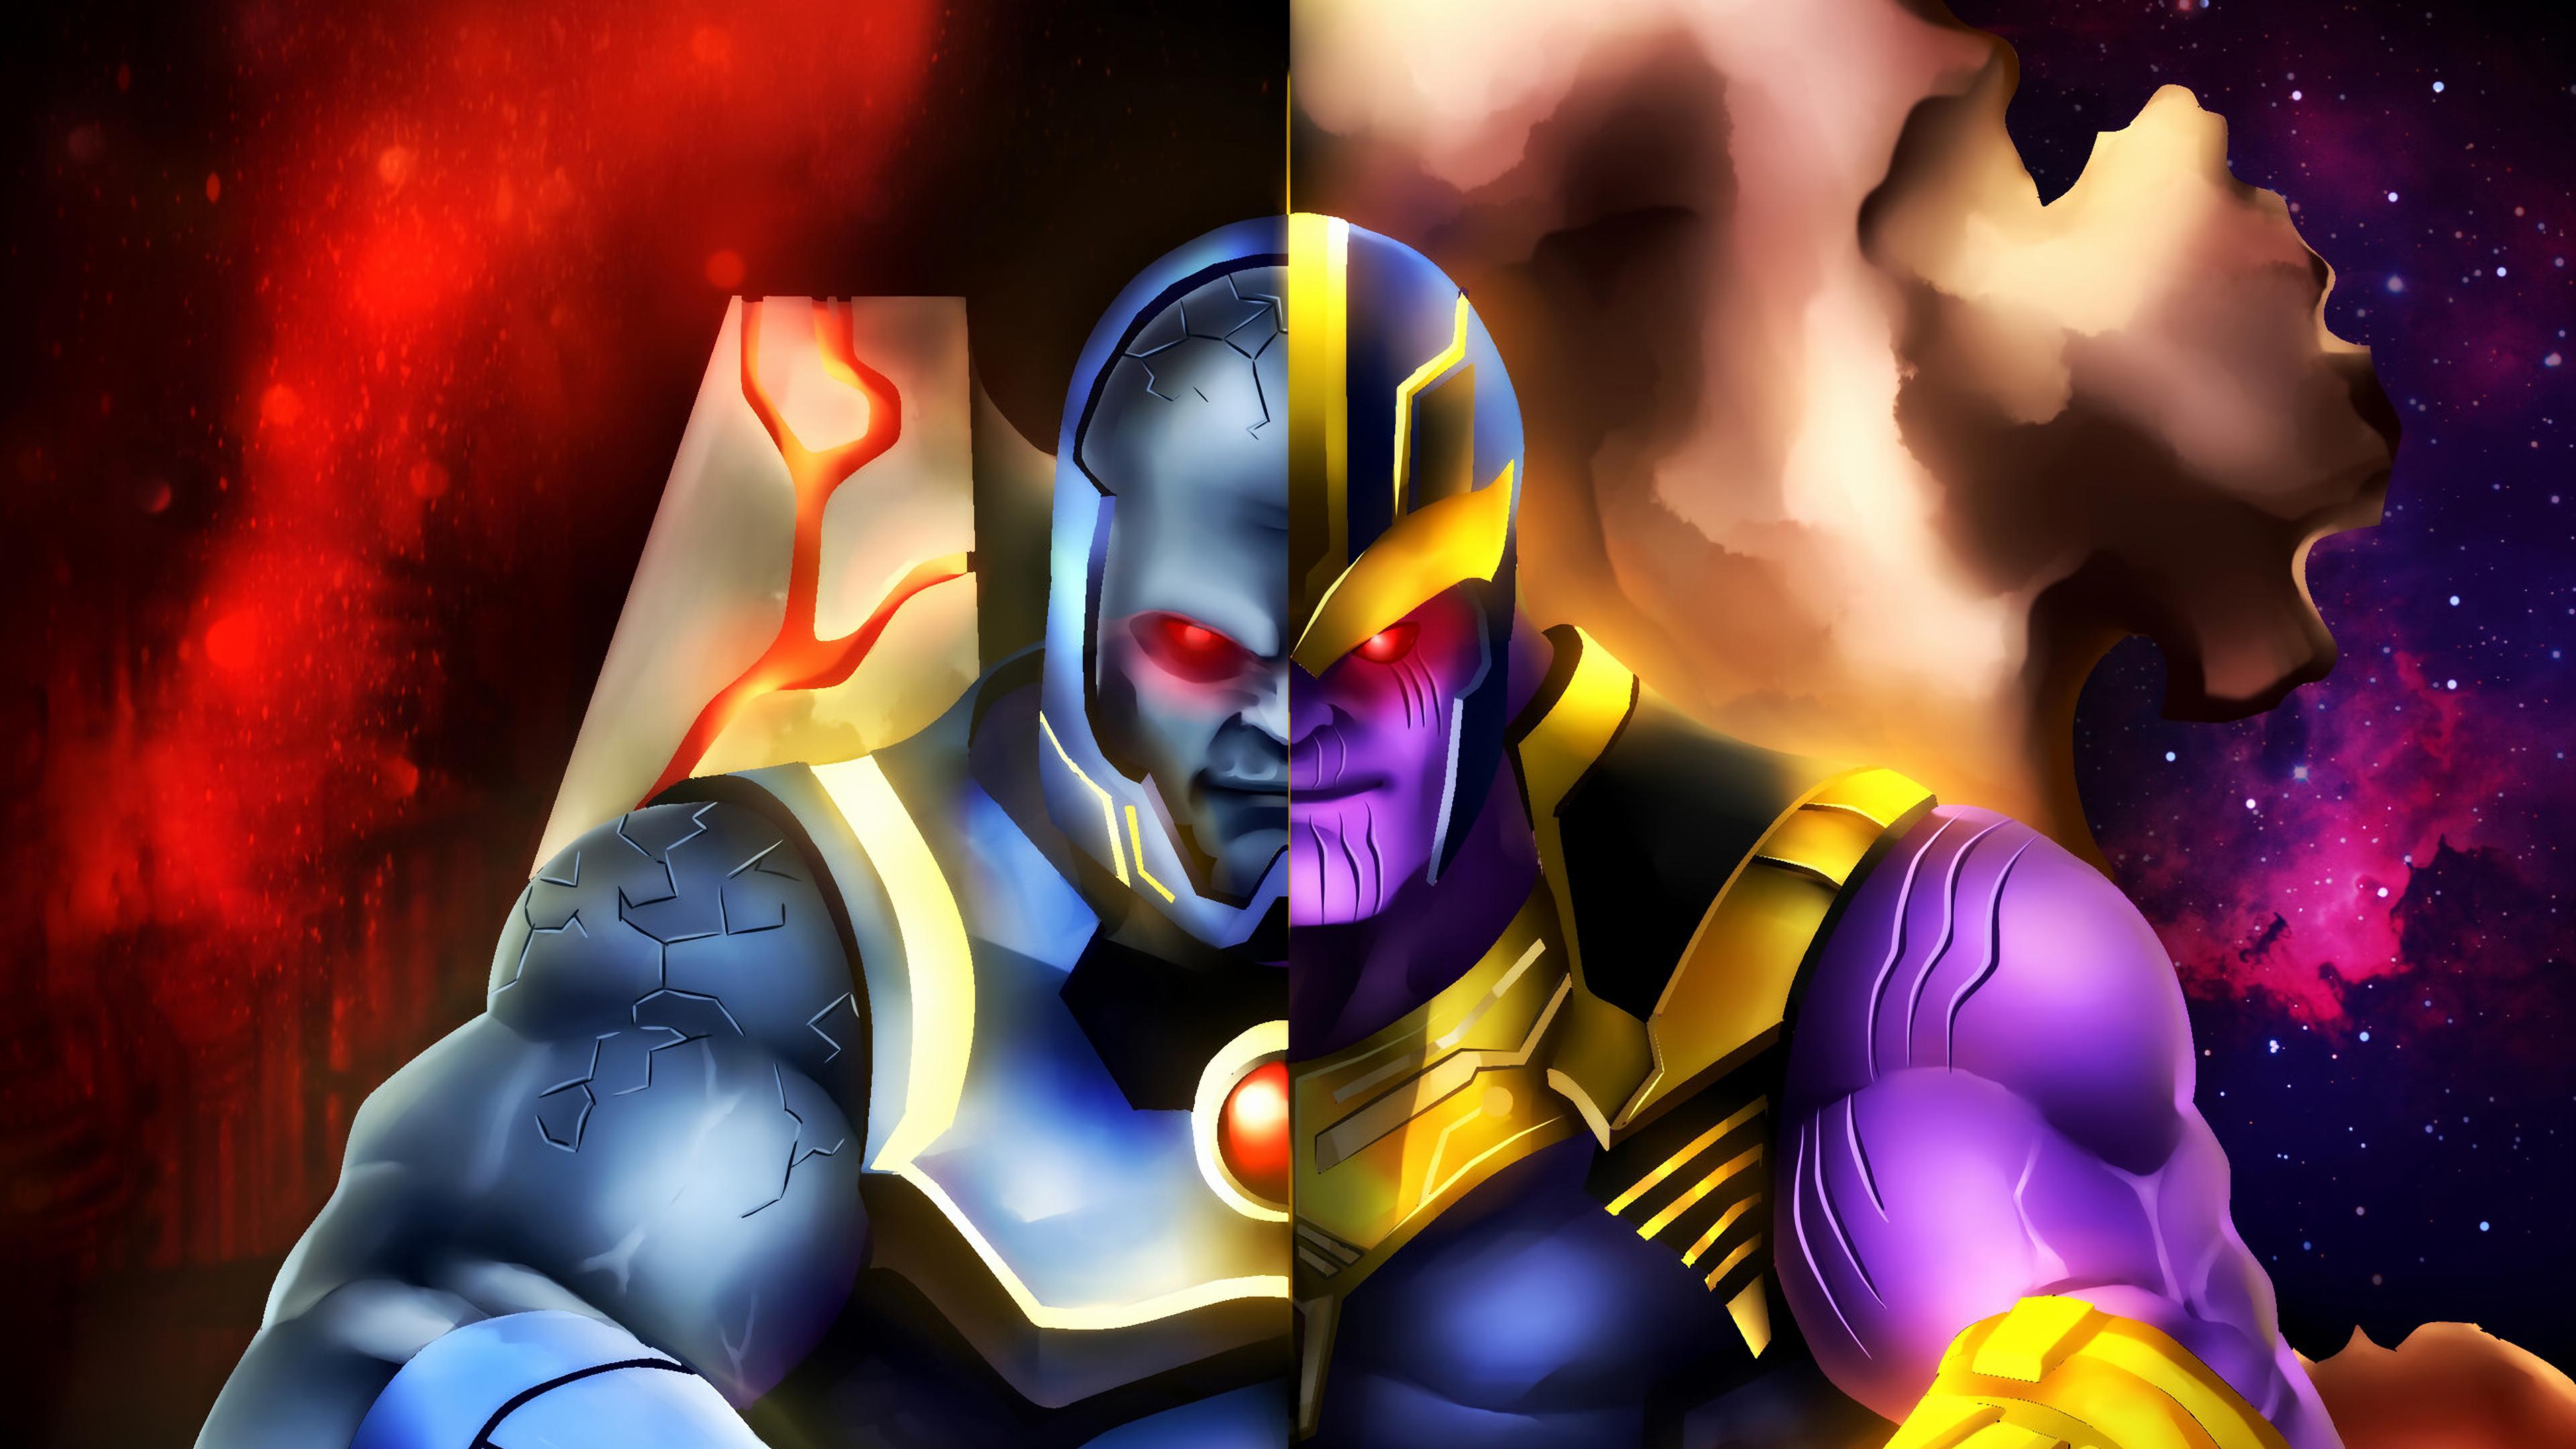 darkseid vs thanos 1568055239 - Darkseid Vs Thanos - thanos-wallpapers, supervillain wallpapers, hd-wallpapers, darkseid wallpapers, 4k-wallpapers